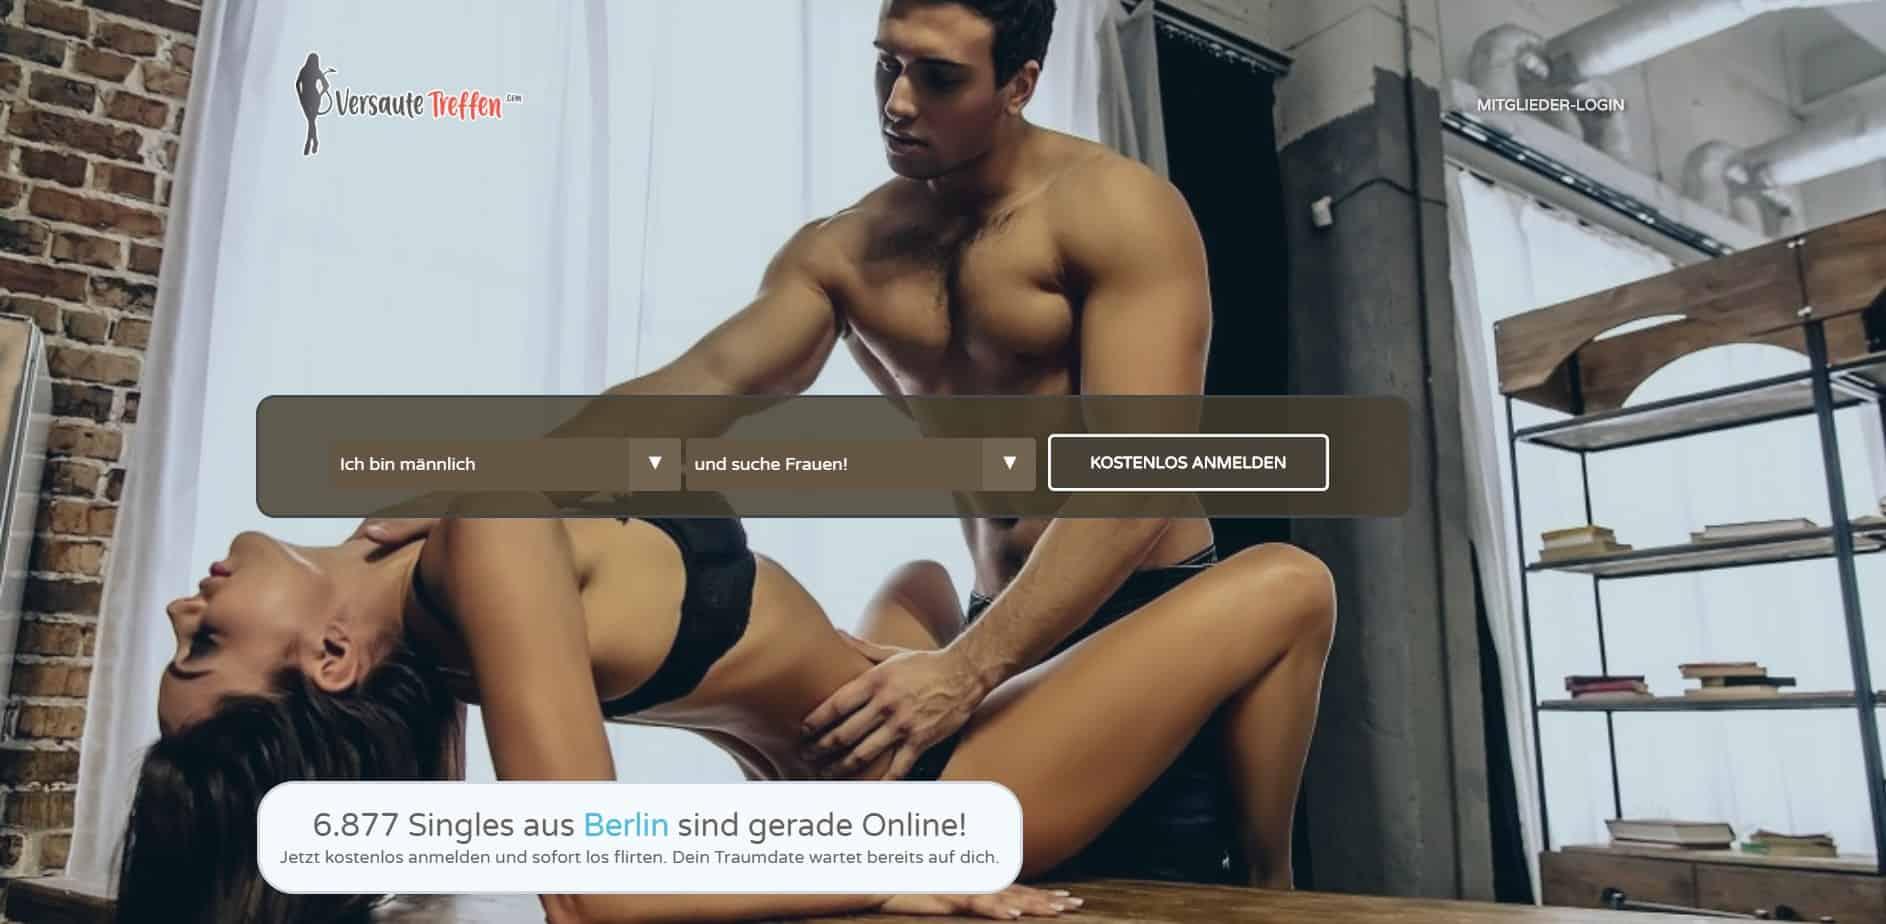 Testbericht: VersauteTreffen.com Abzocke